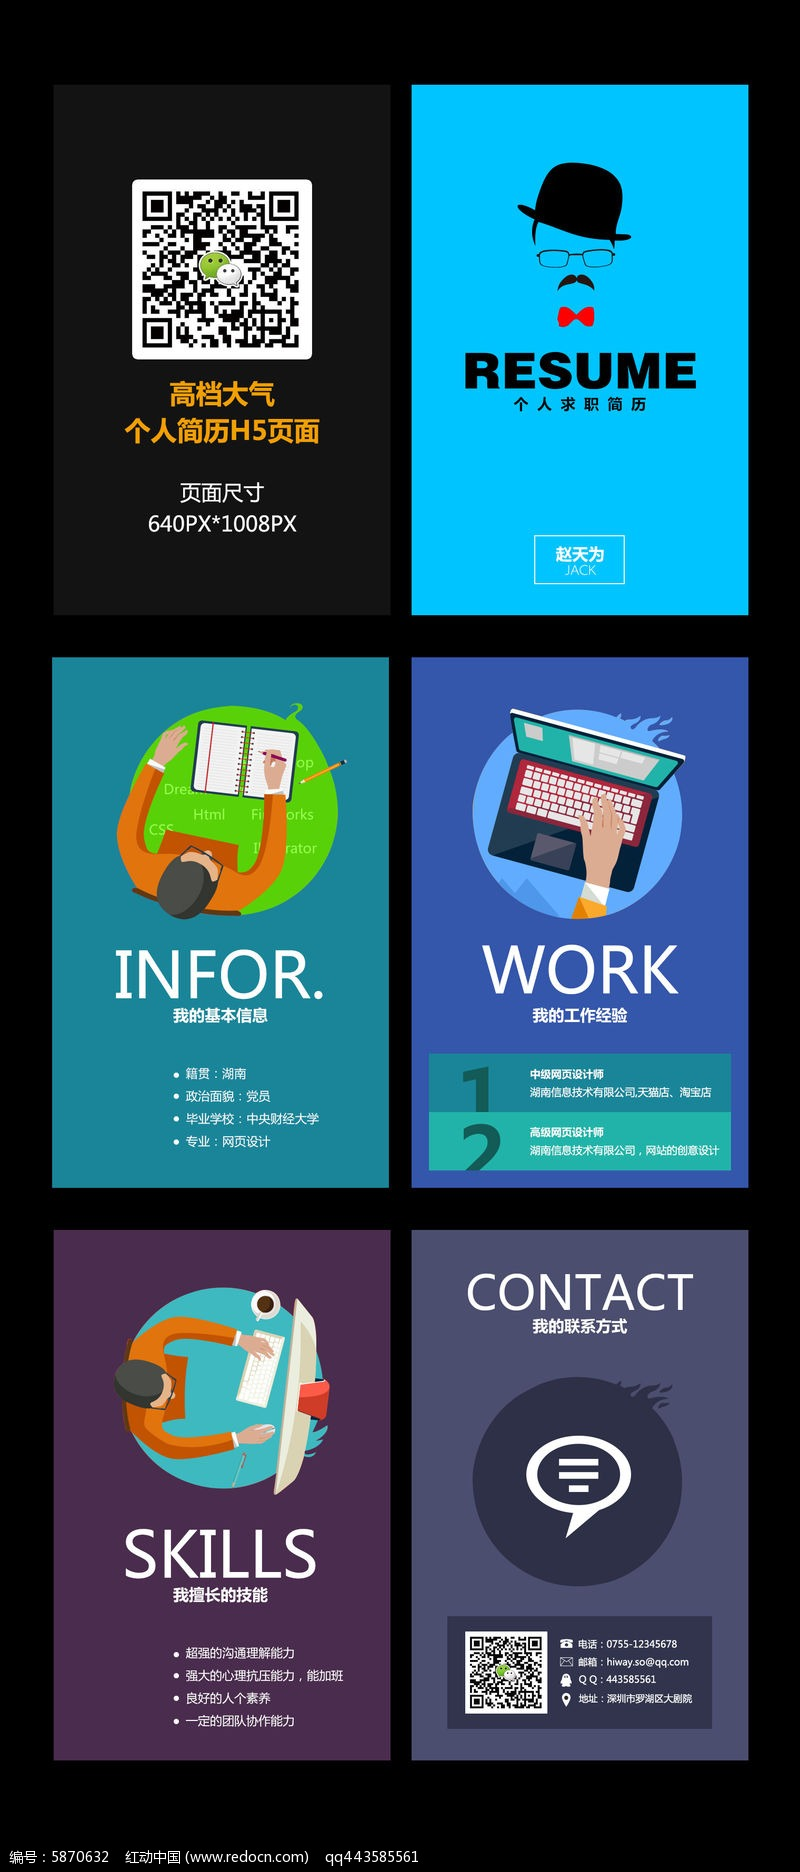 h5创意个人求职面试简历模板下载图片